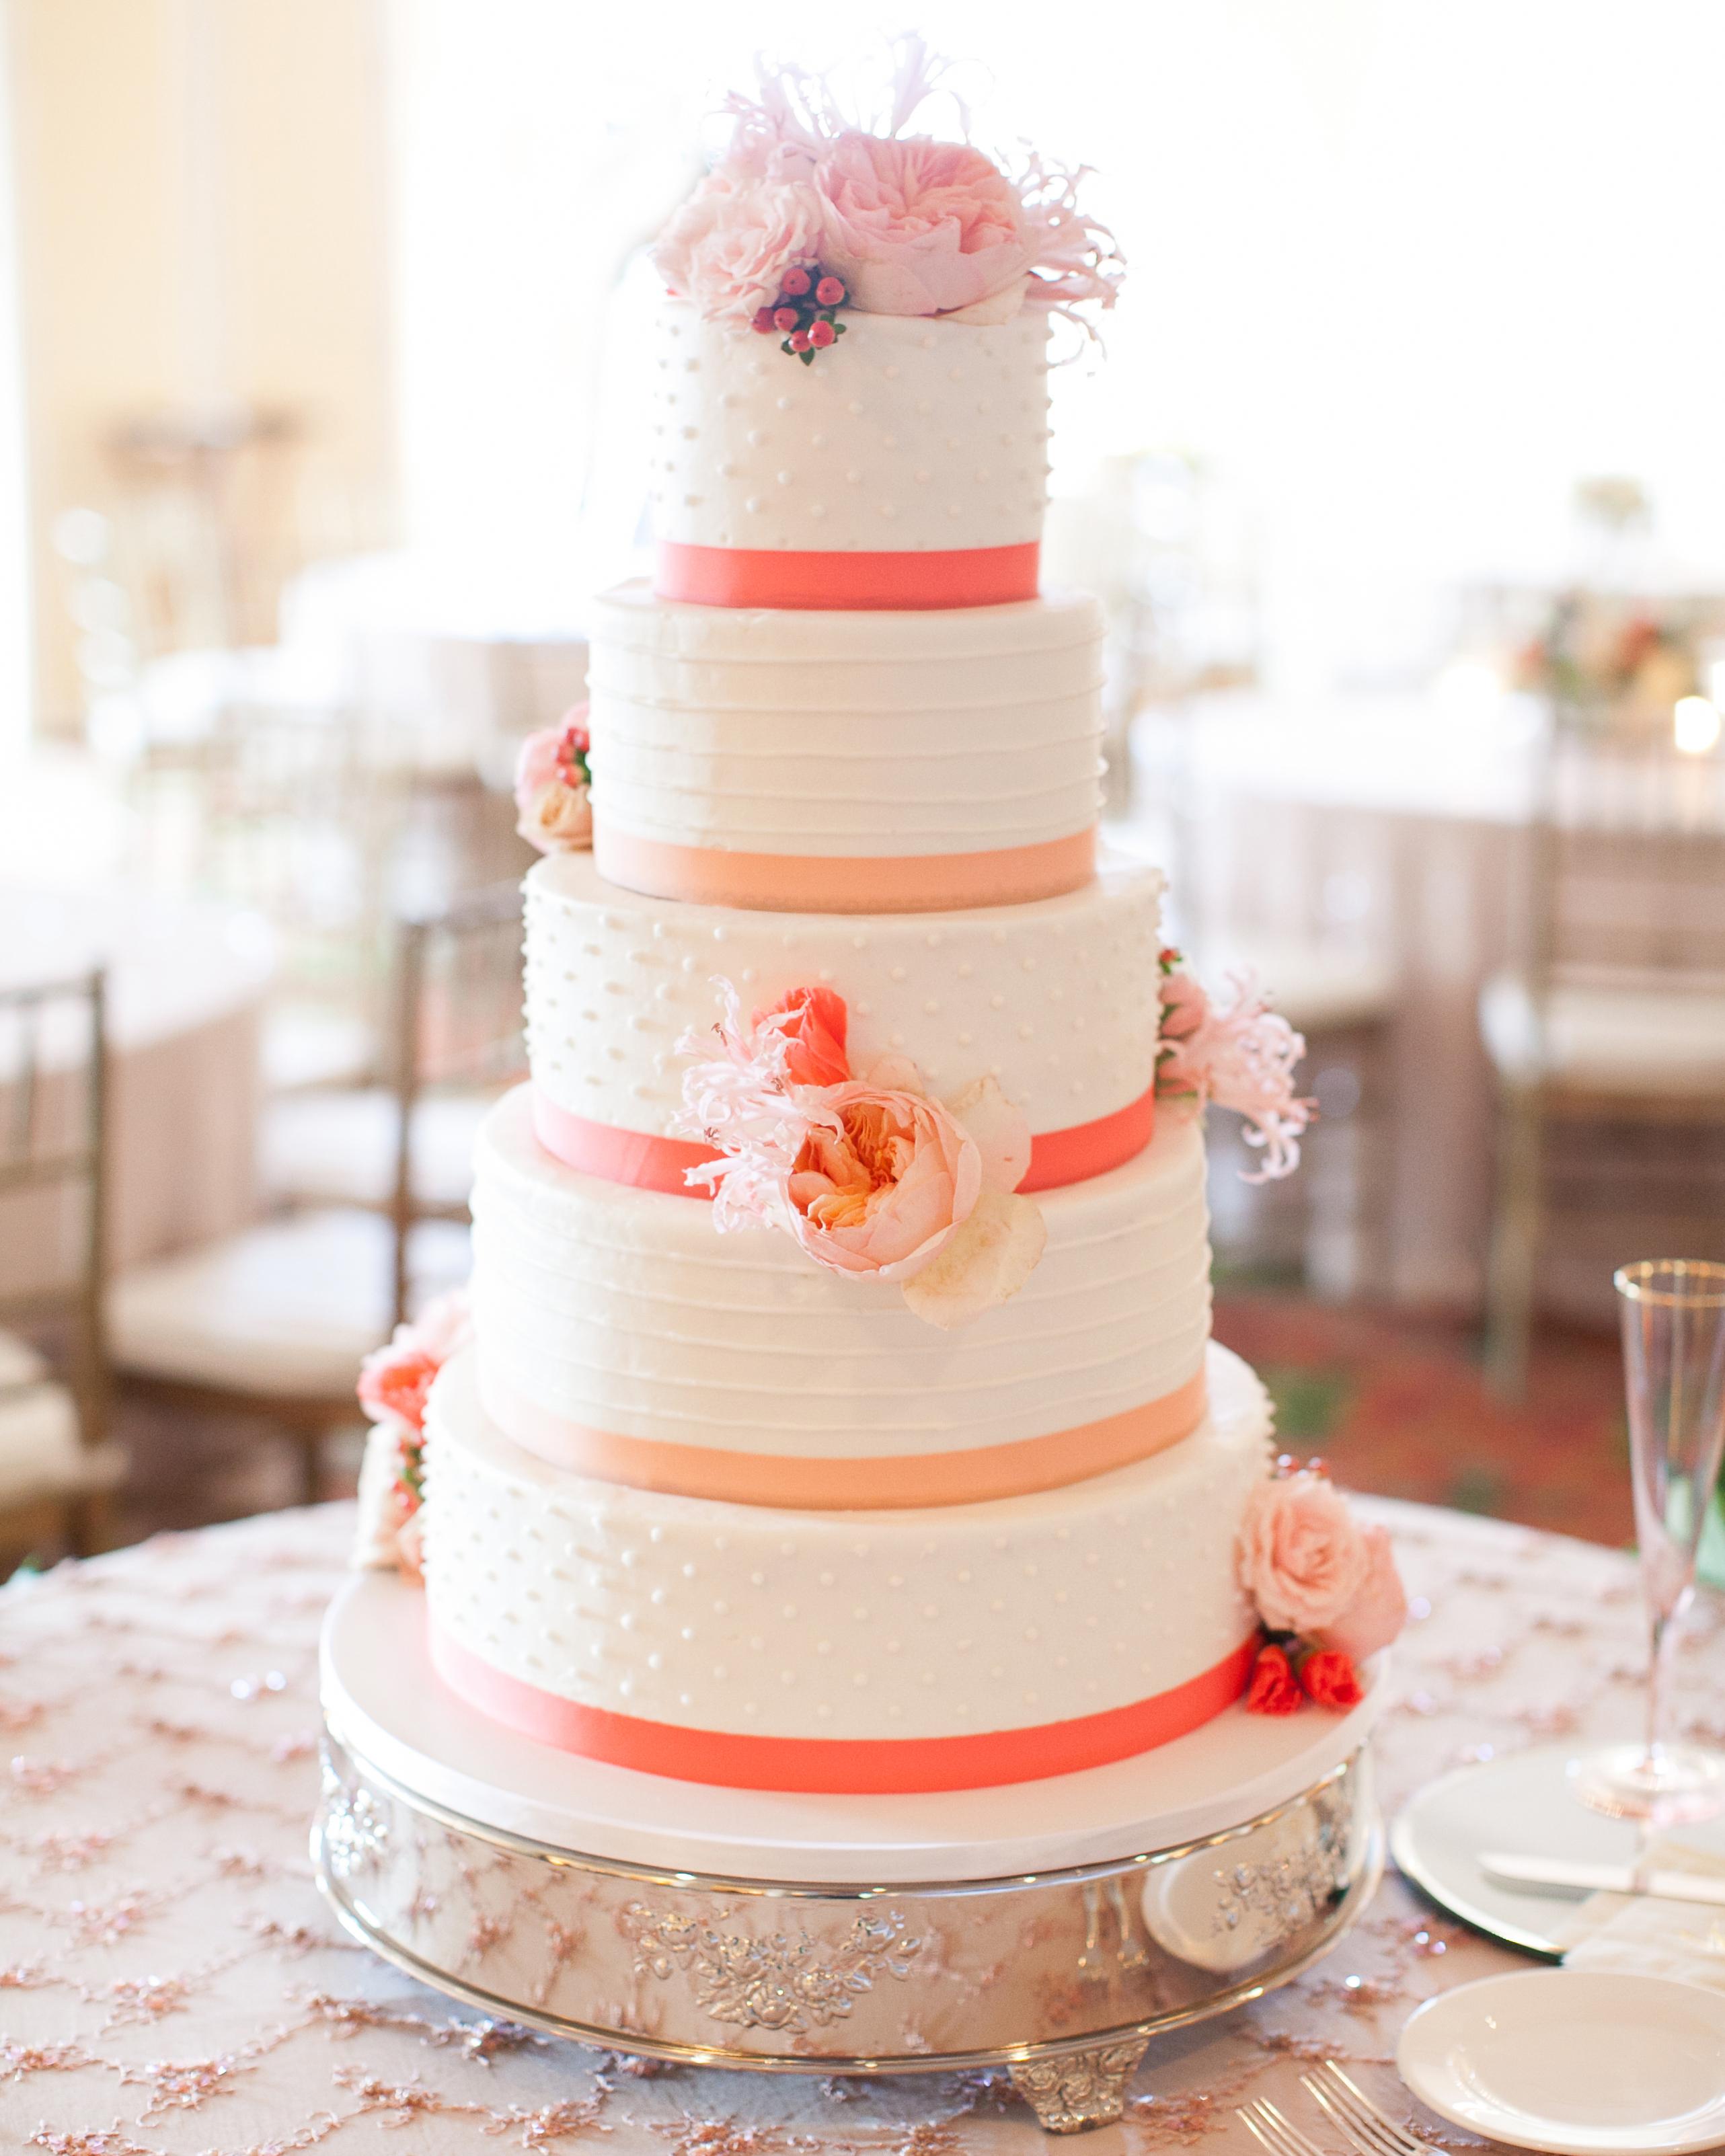 molly-patrick-wedding-cake-3524-s111760-0115.jpg